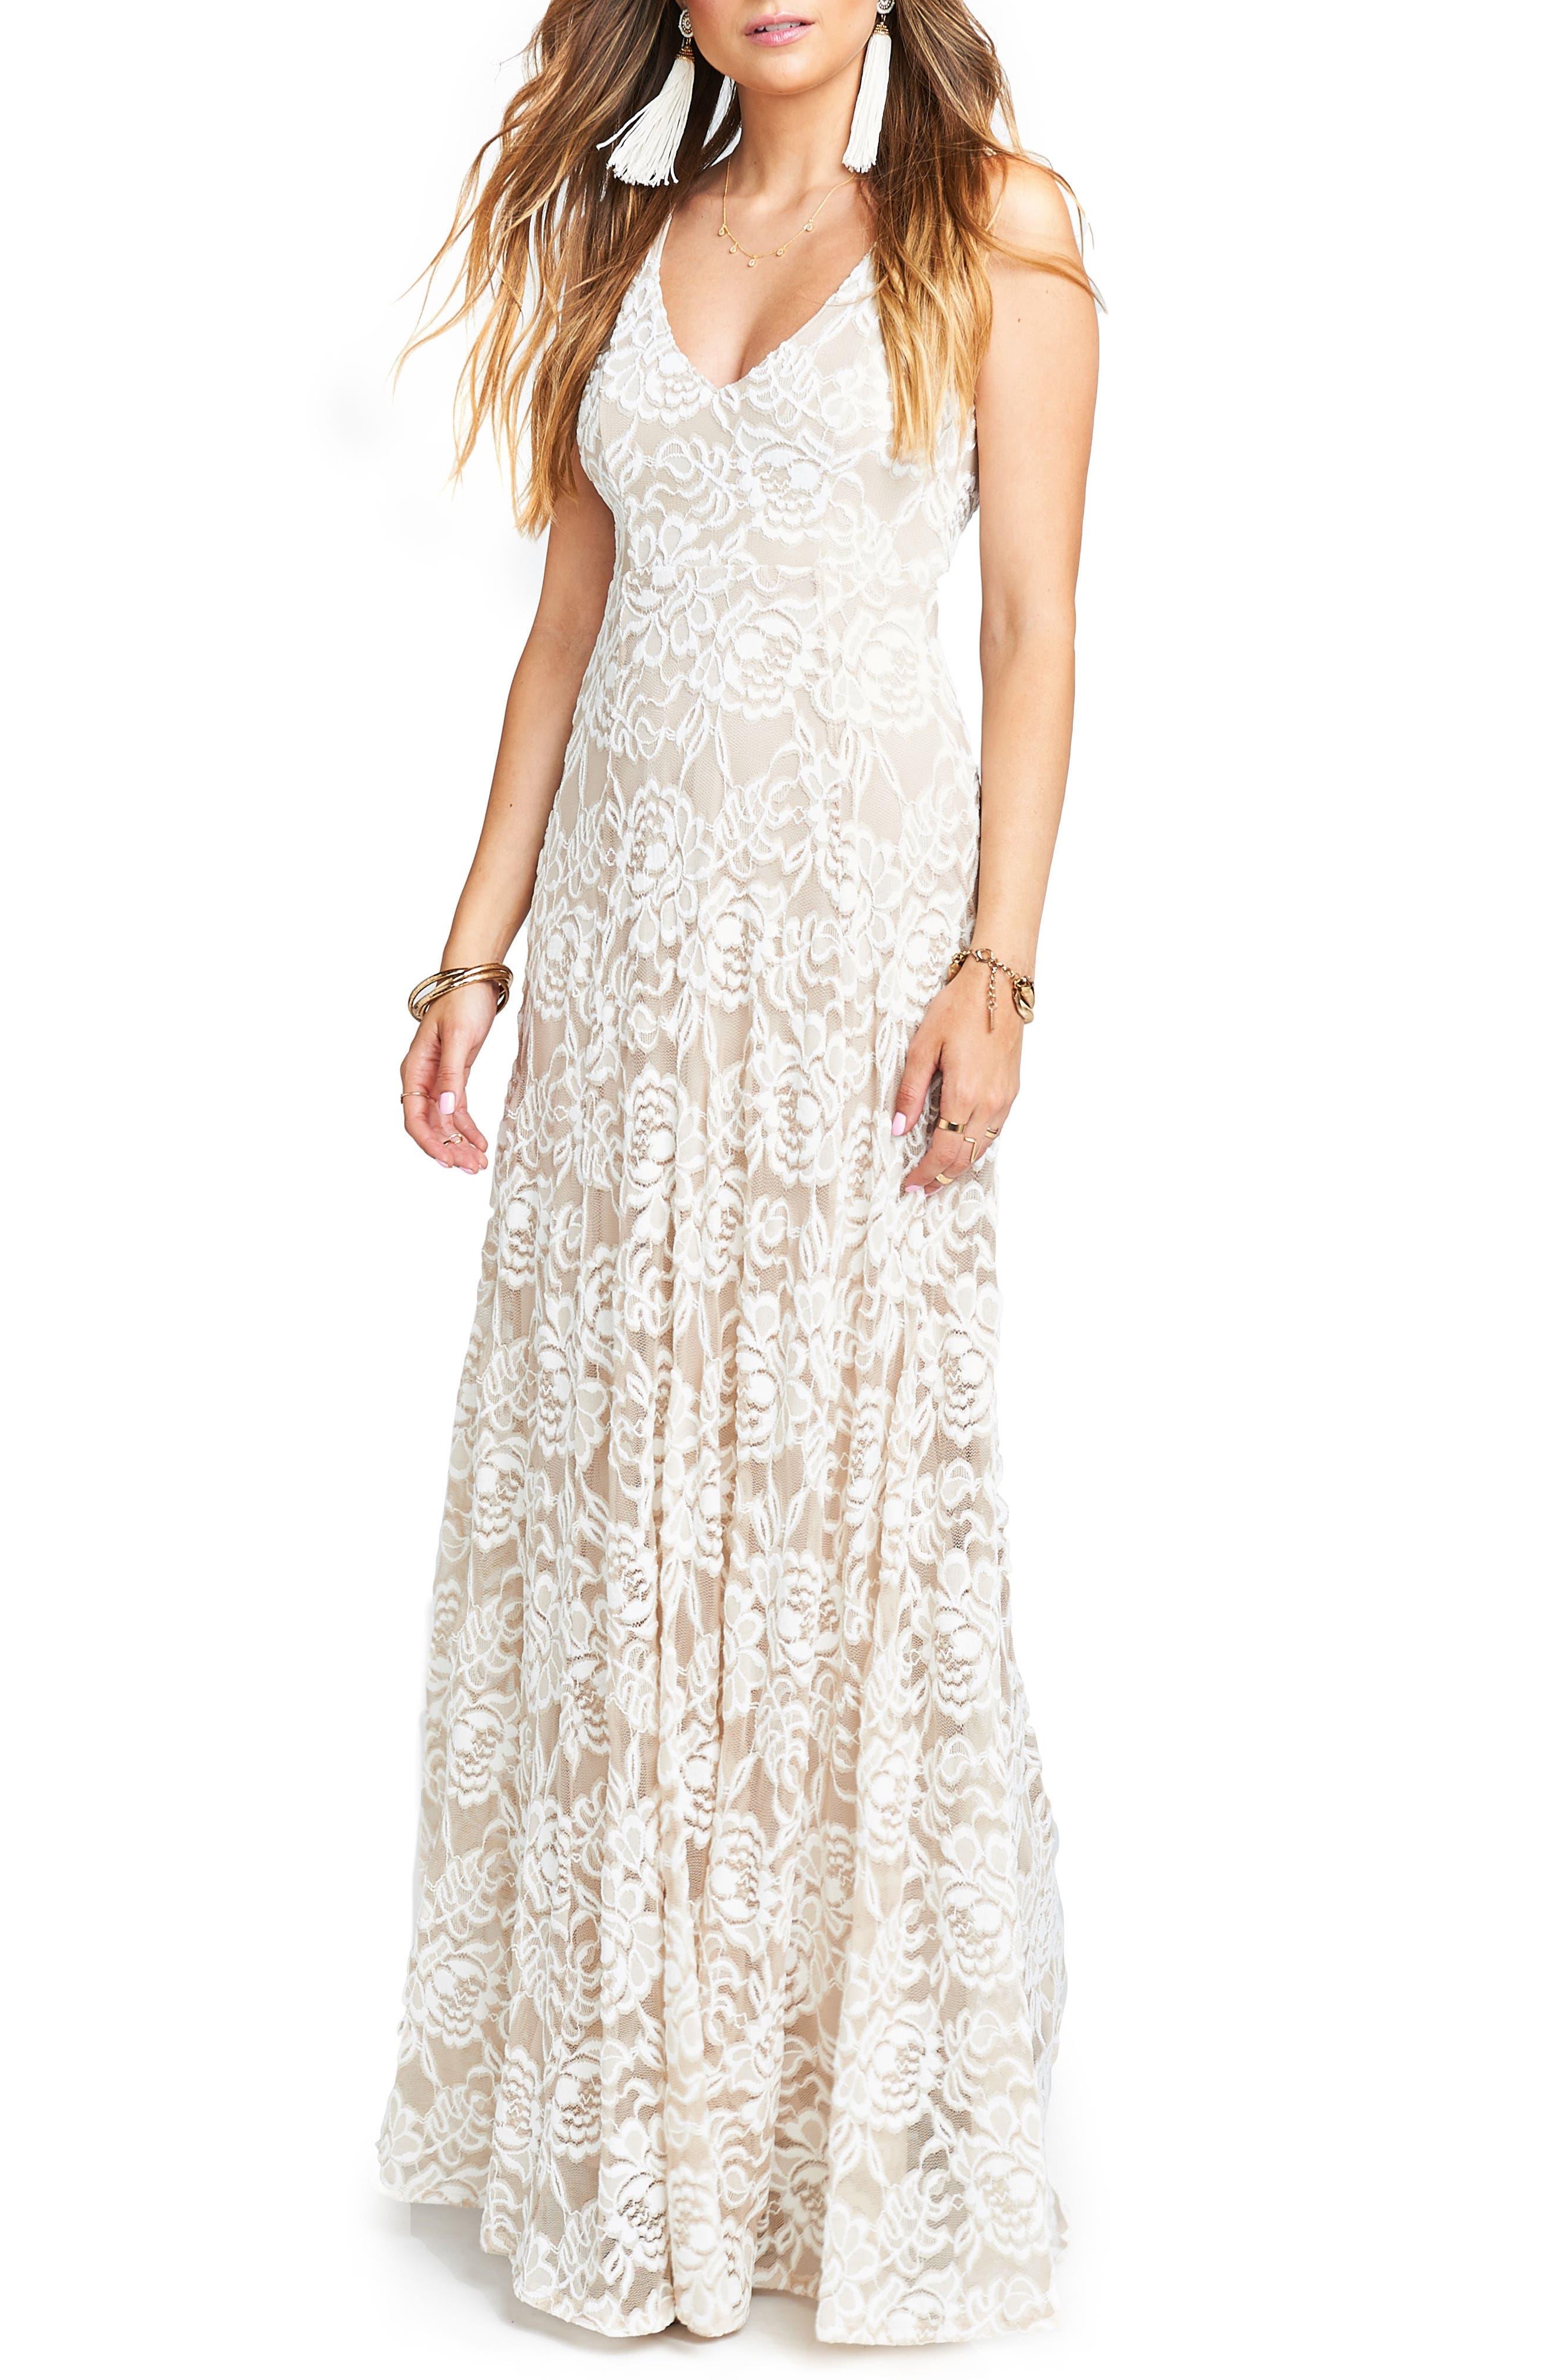 Jen Lace Dress,                             Main thumbnail 1, color,                             LOVERS LACE SHOW ME THE RING